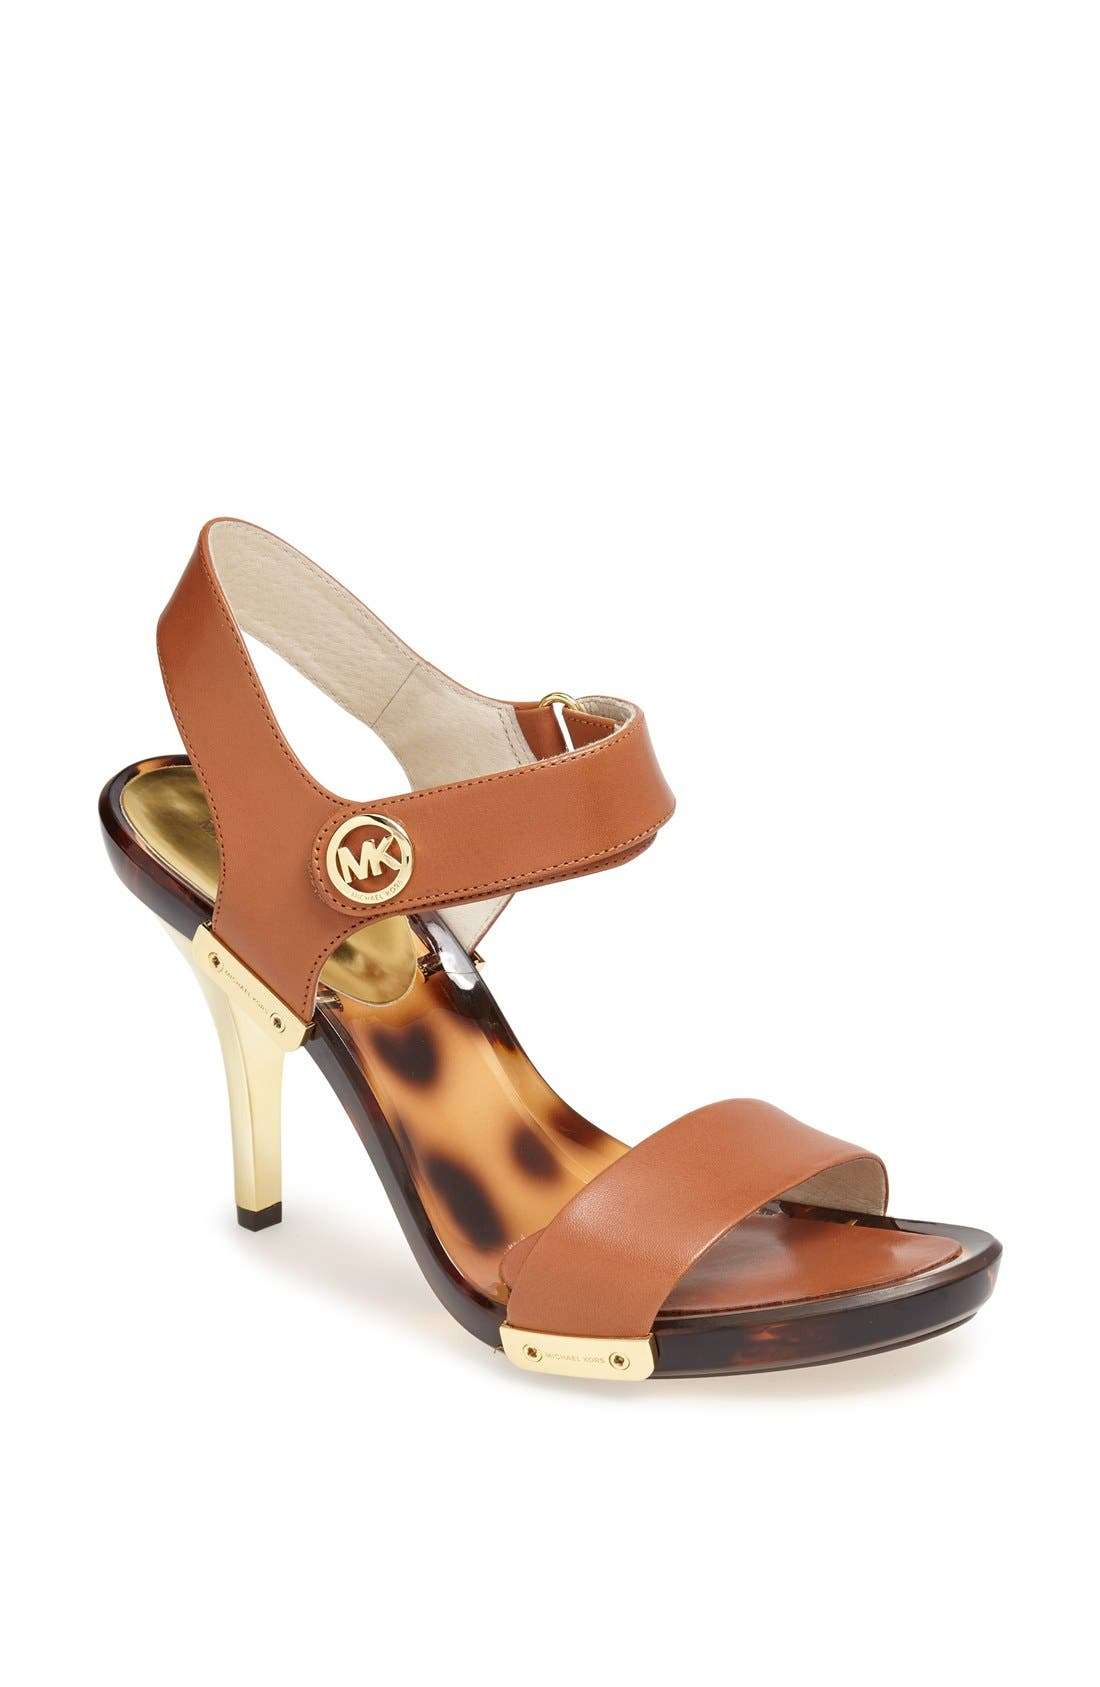 Alternate Image 1 Selected - MICHAEL Michael Kors 'Lani' Patent Leather Sandal